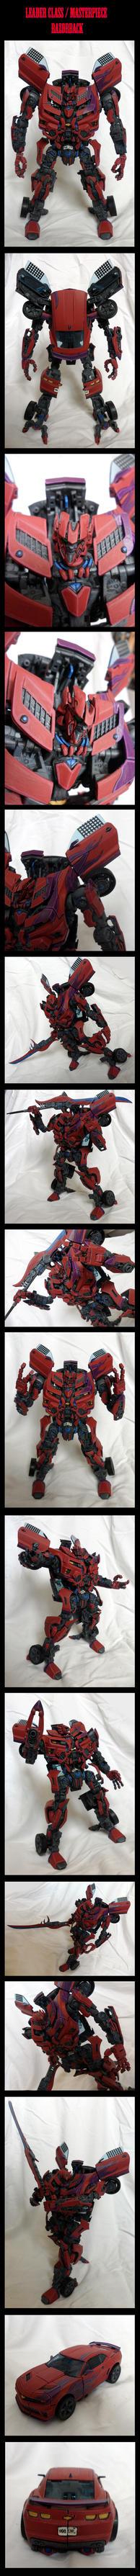 Leader Class / Masterpiece Razorback by Poo-Fly